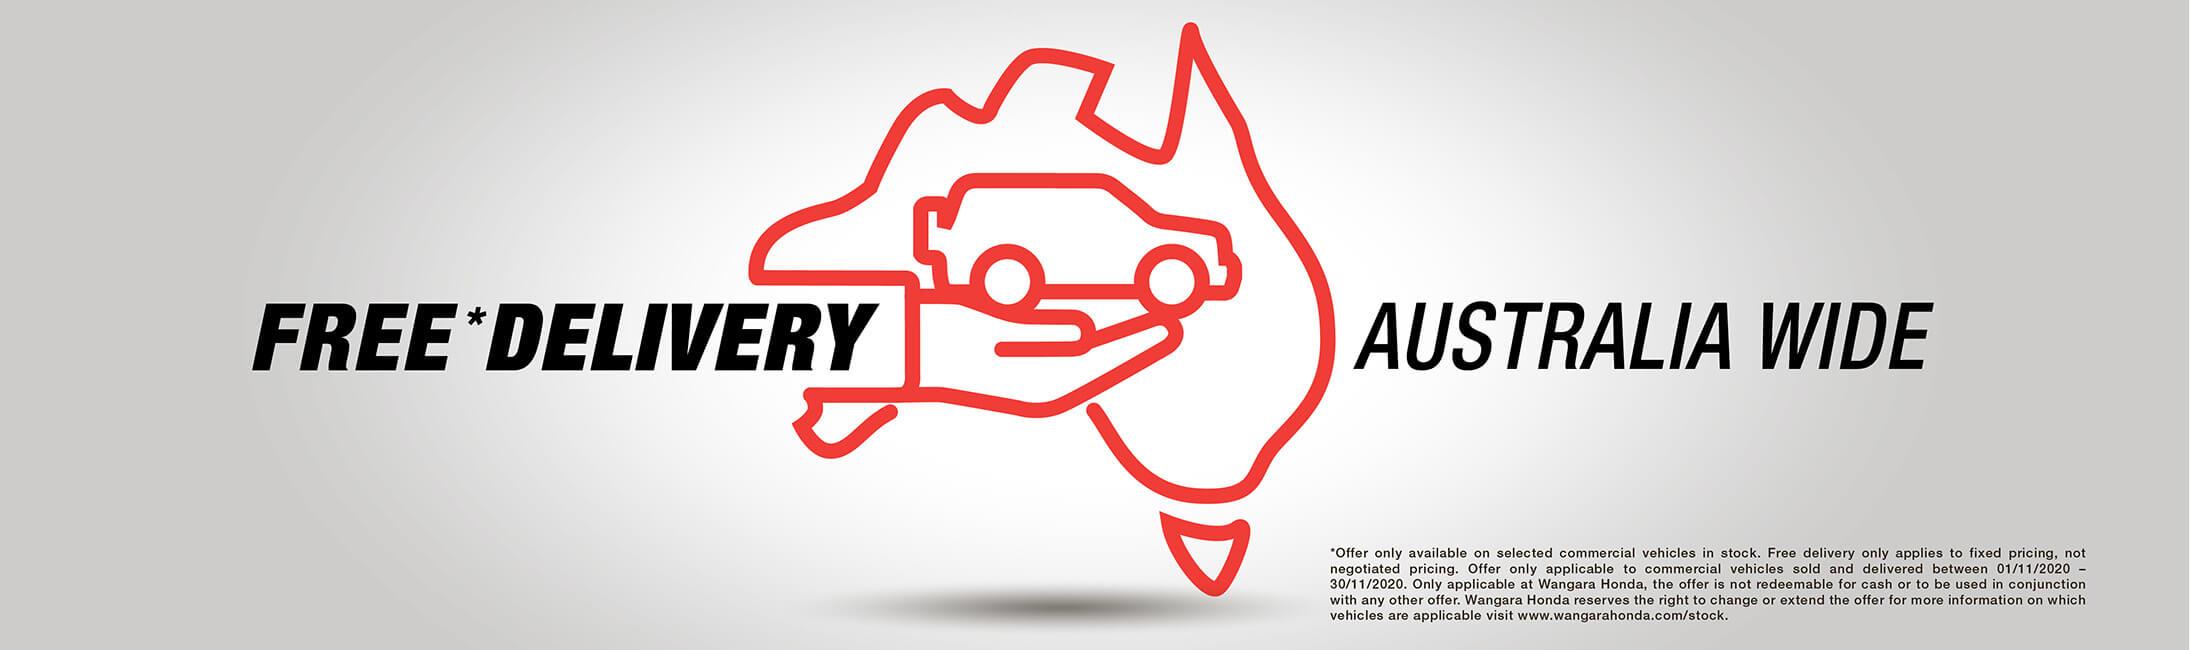 Wangara Honda Free Delivery Australia Wide